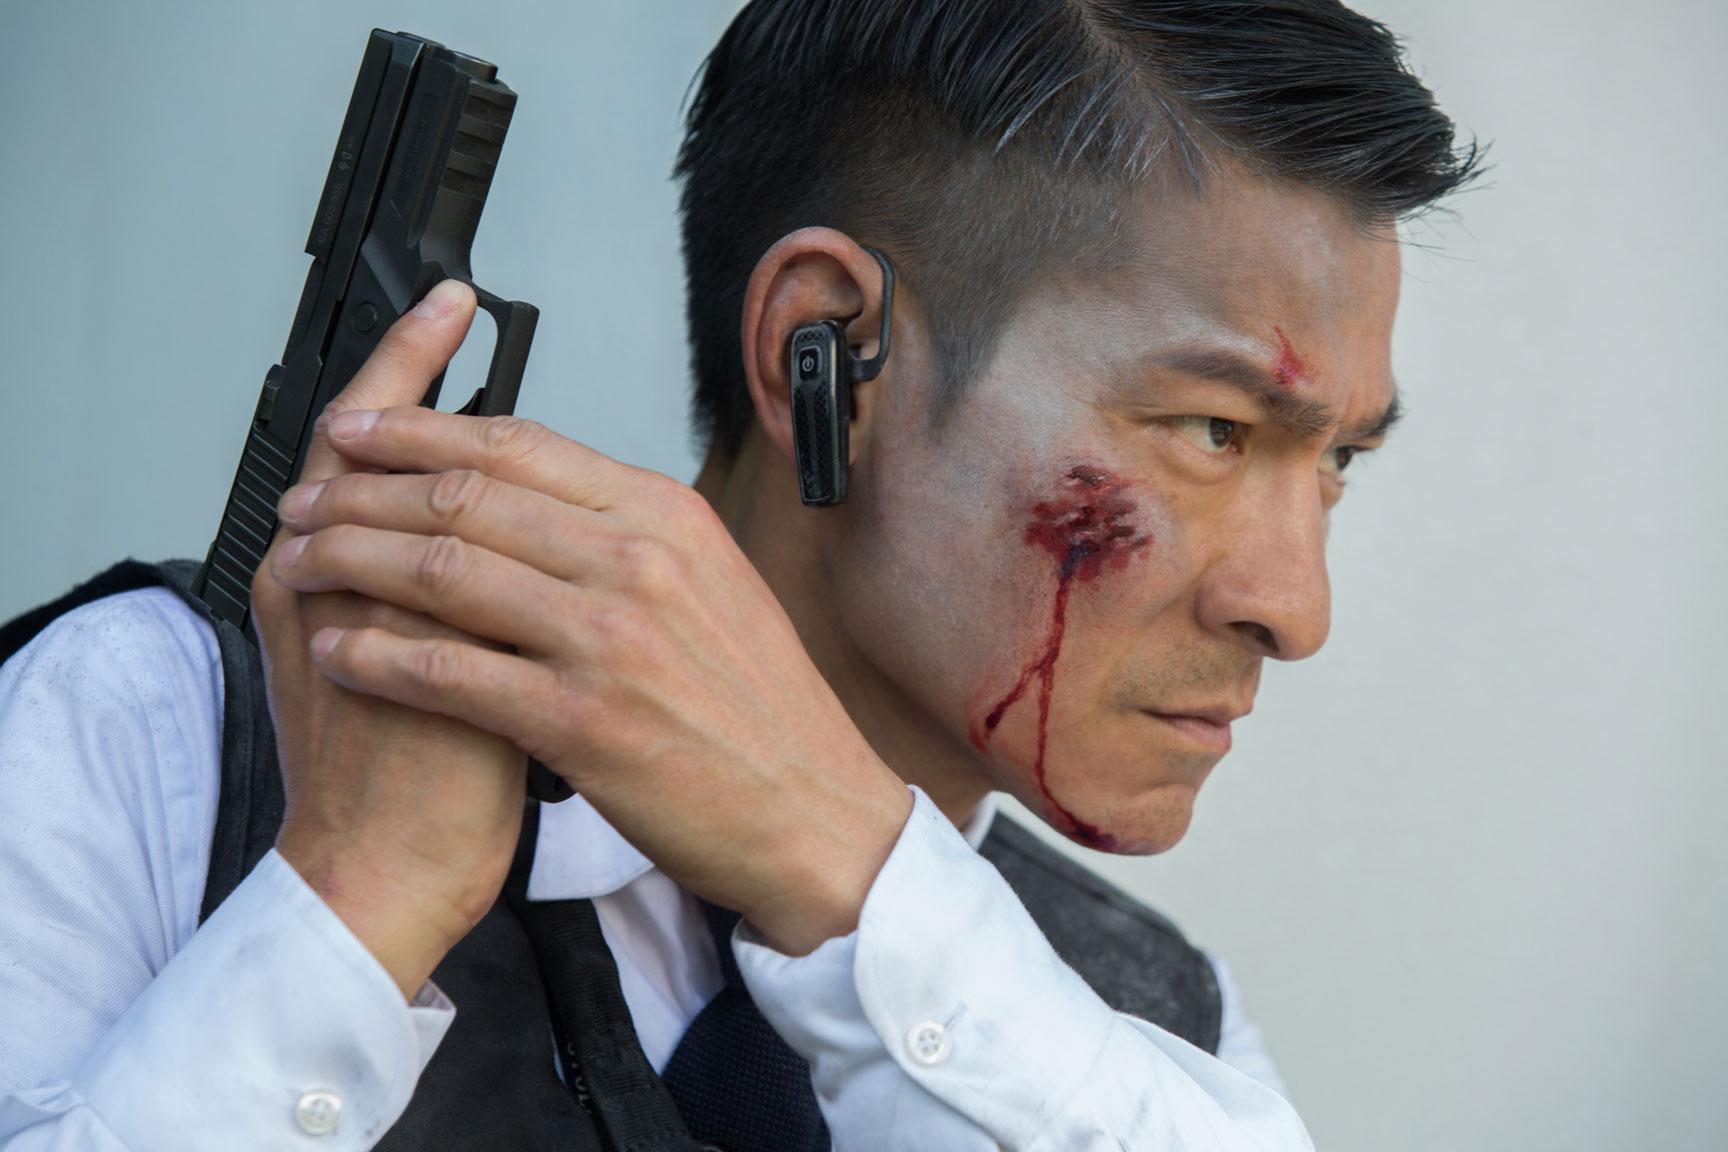 Japanese bank robbery - 1 5